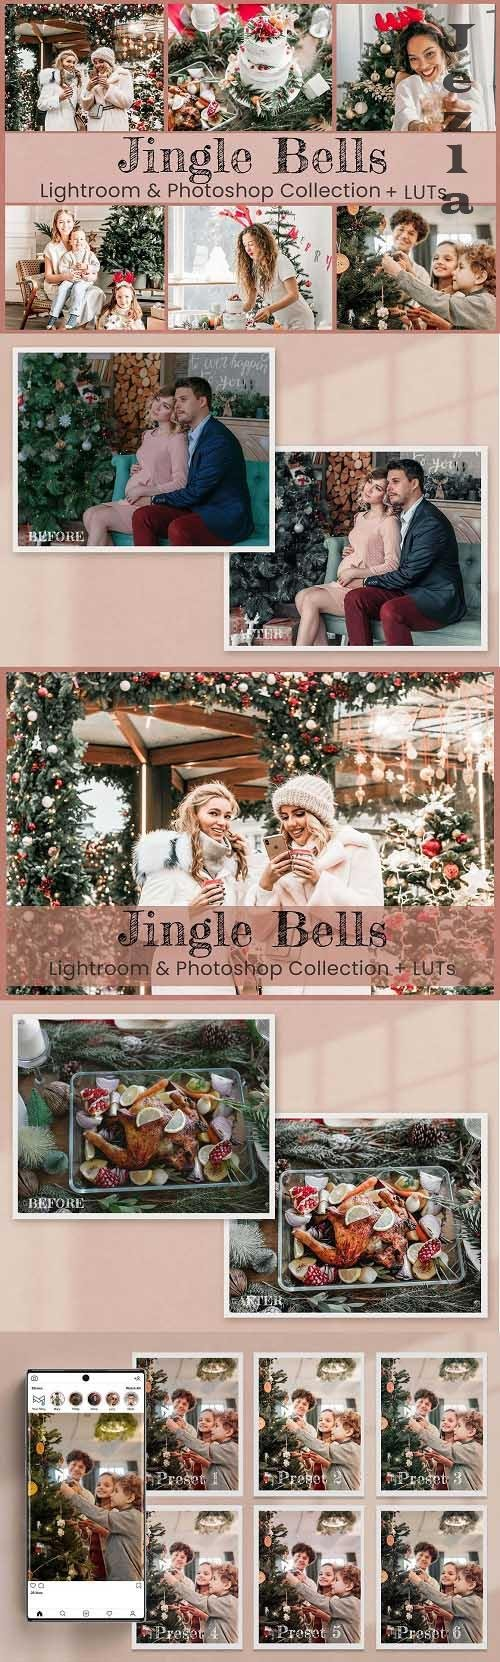 Jingle Bells Lightroom Photoshop LUT - 6562871